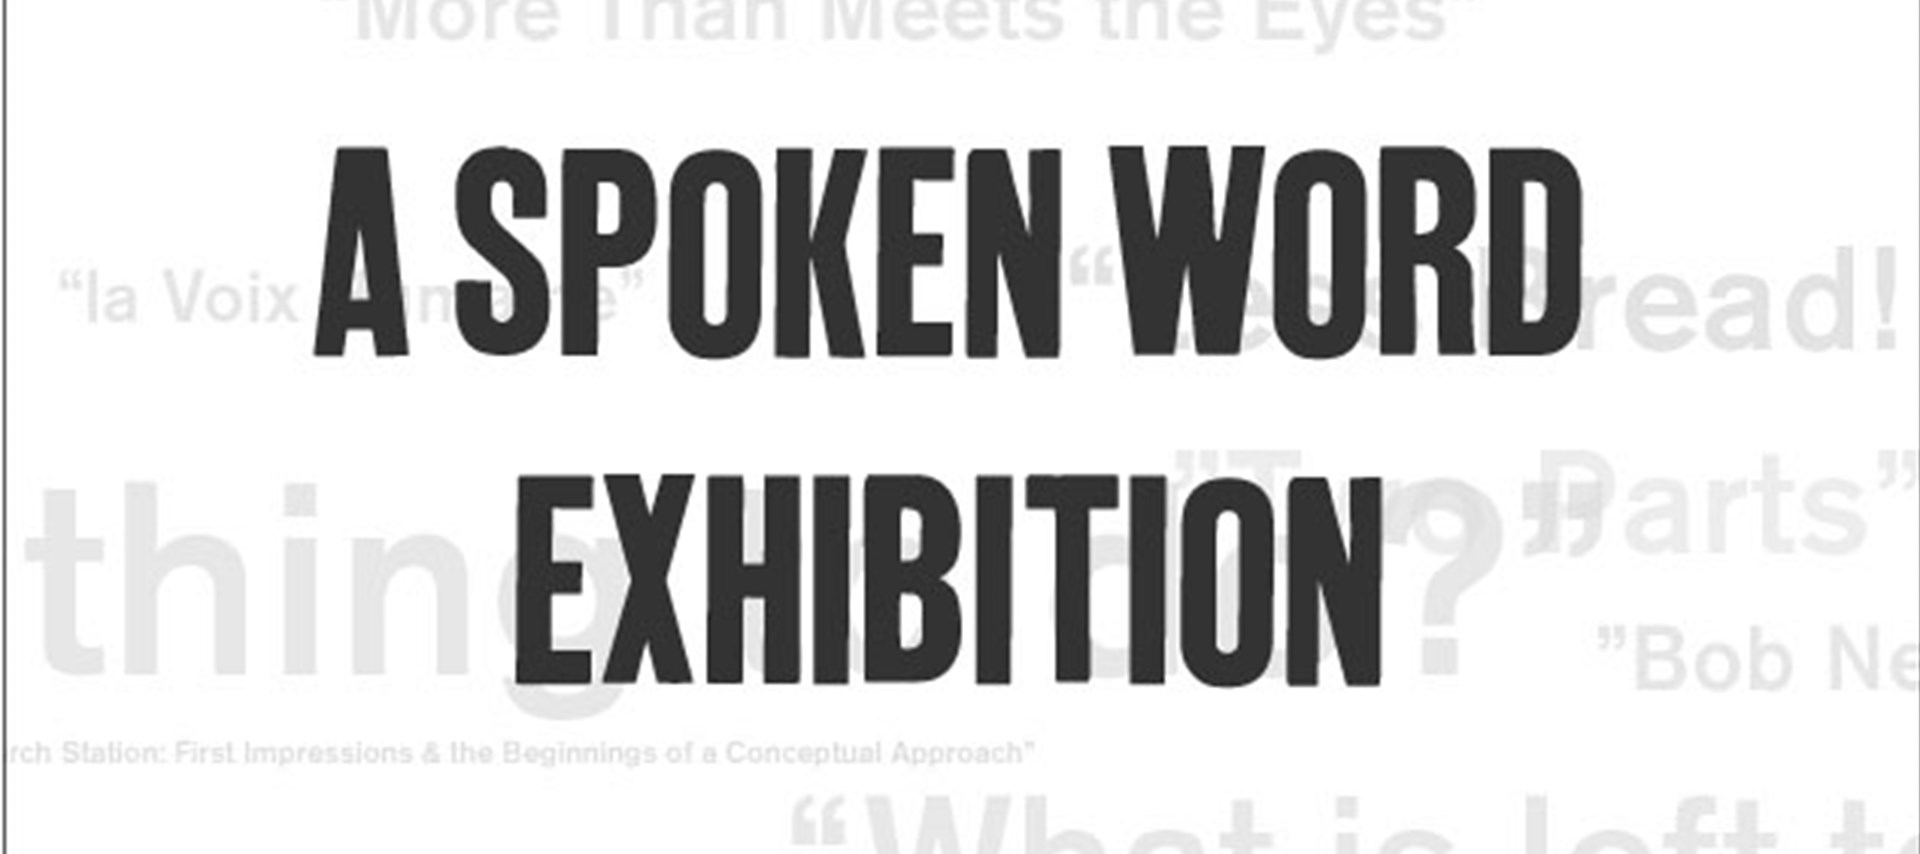 A Spoken Word Exhibition